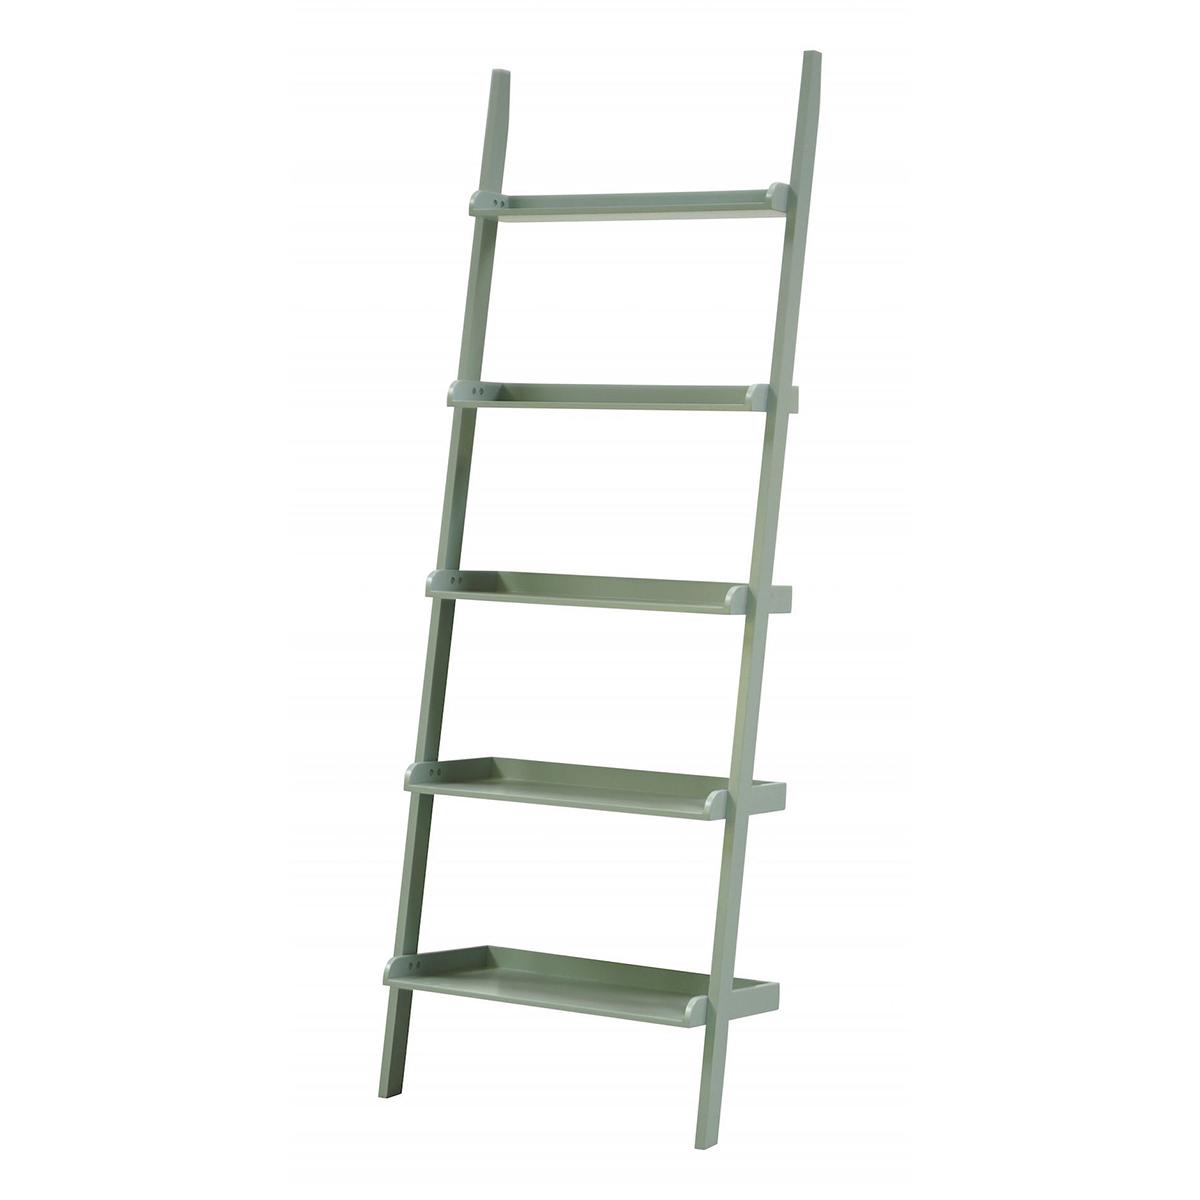 artichok boekenkast ladder noah breed decoratie ladder